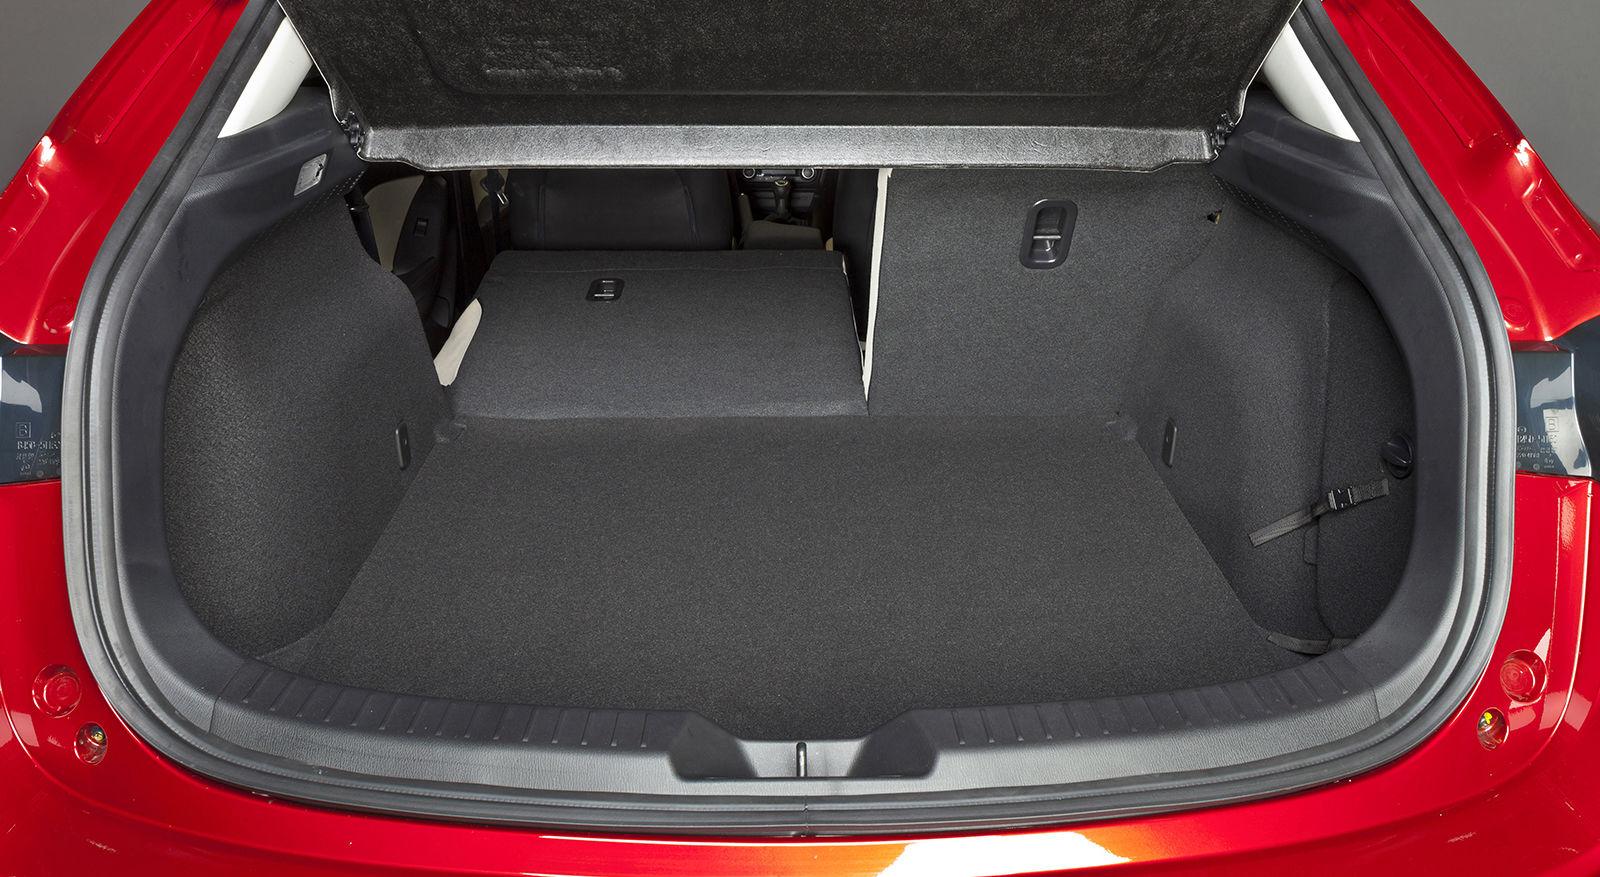 Mazda 3 2010 interior dimensions - Mazda 3 hatchback interior dimensions ...